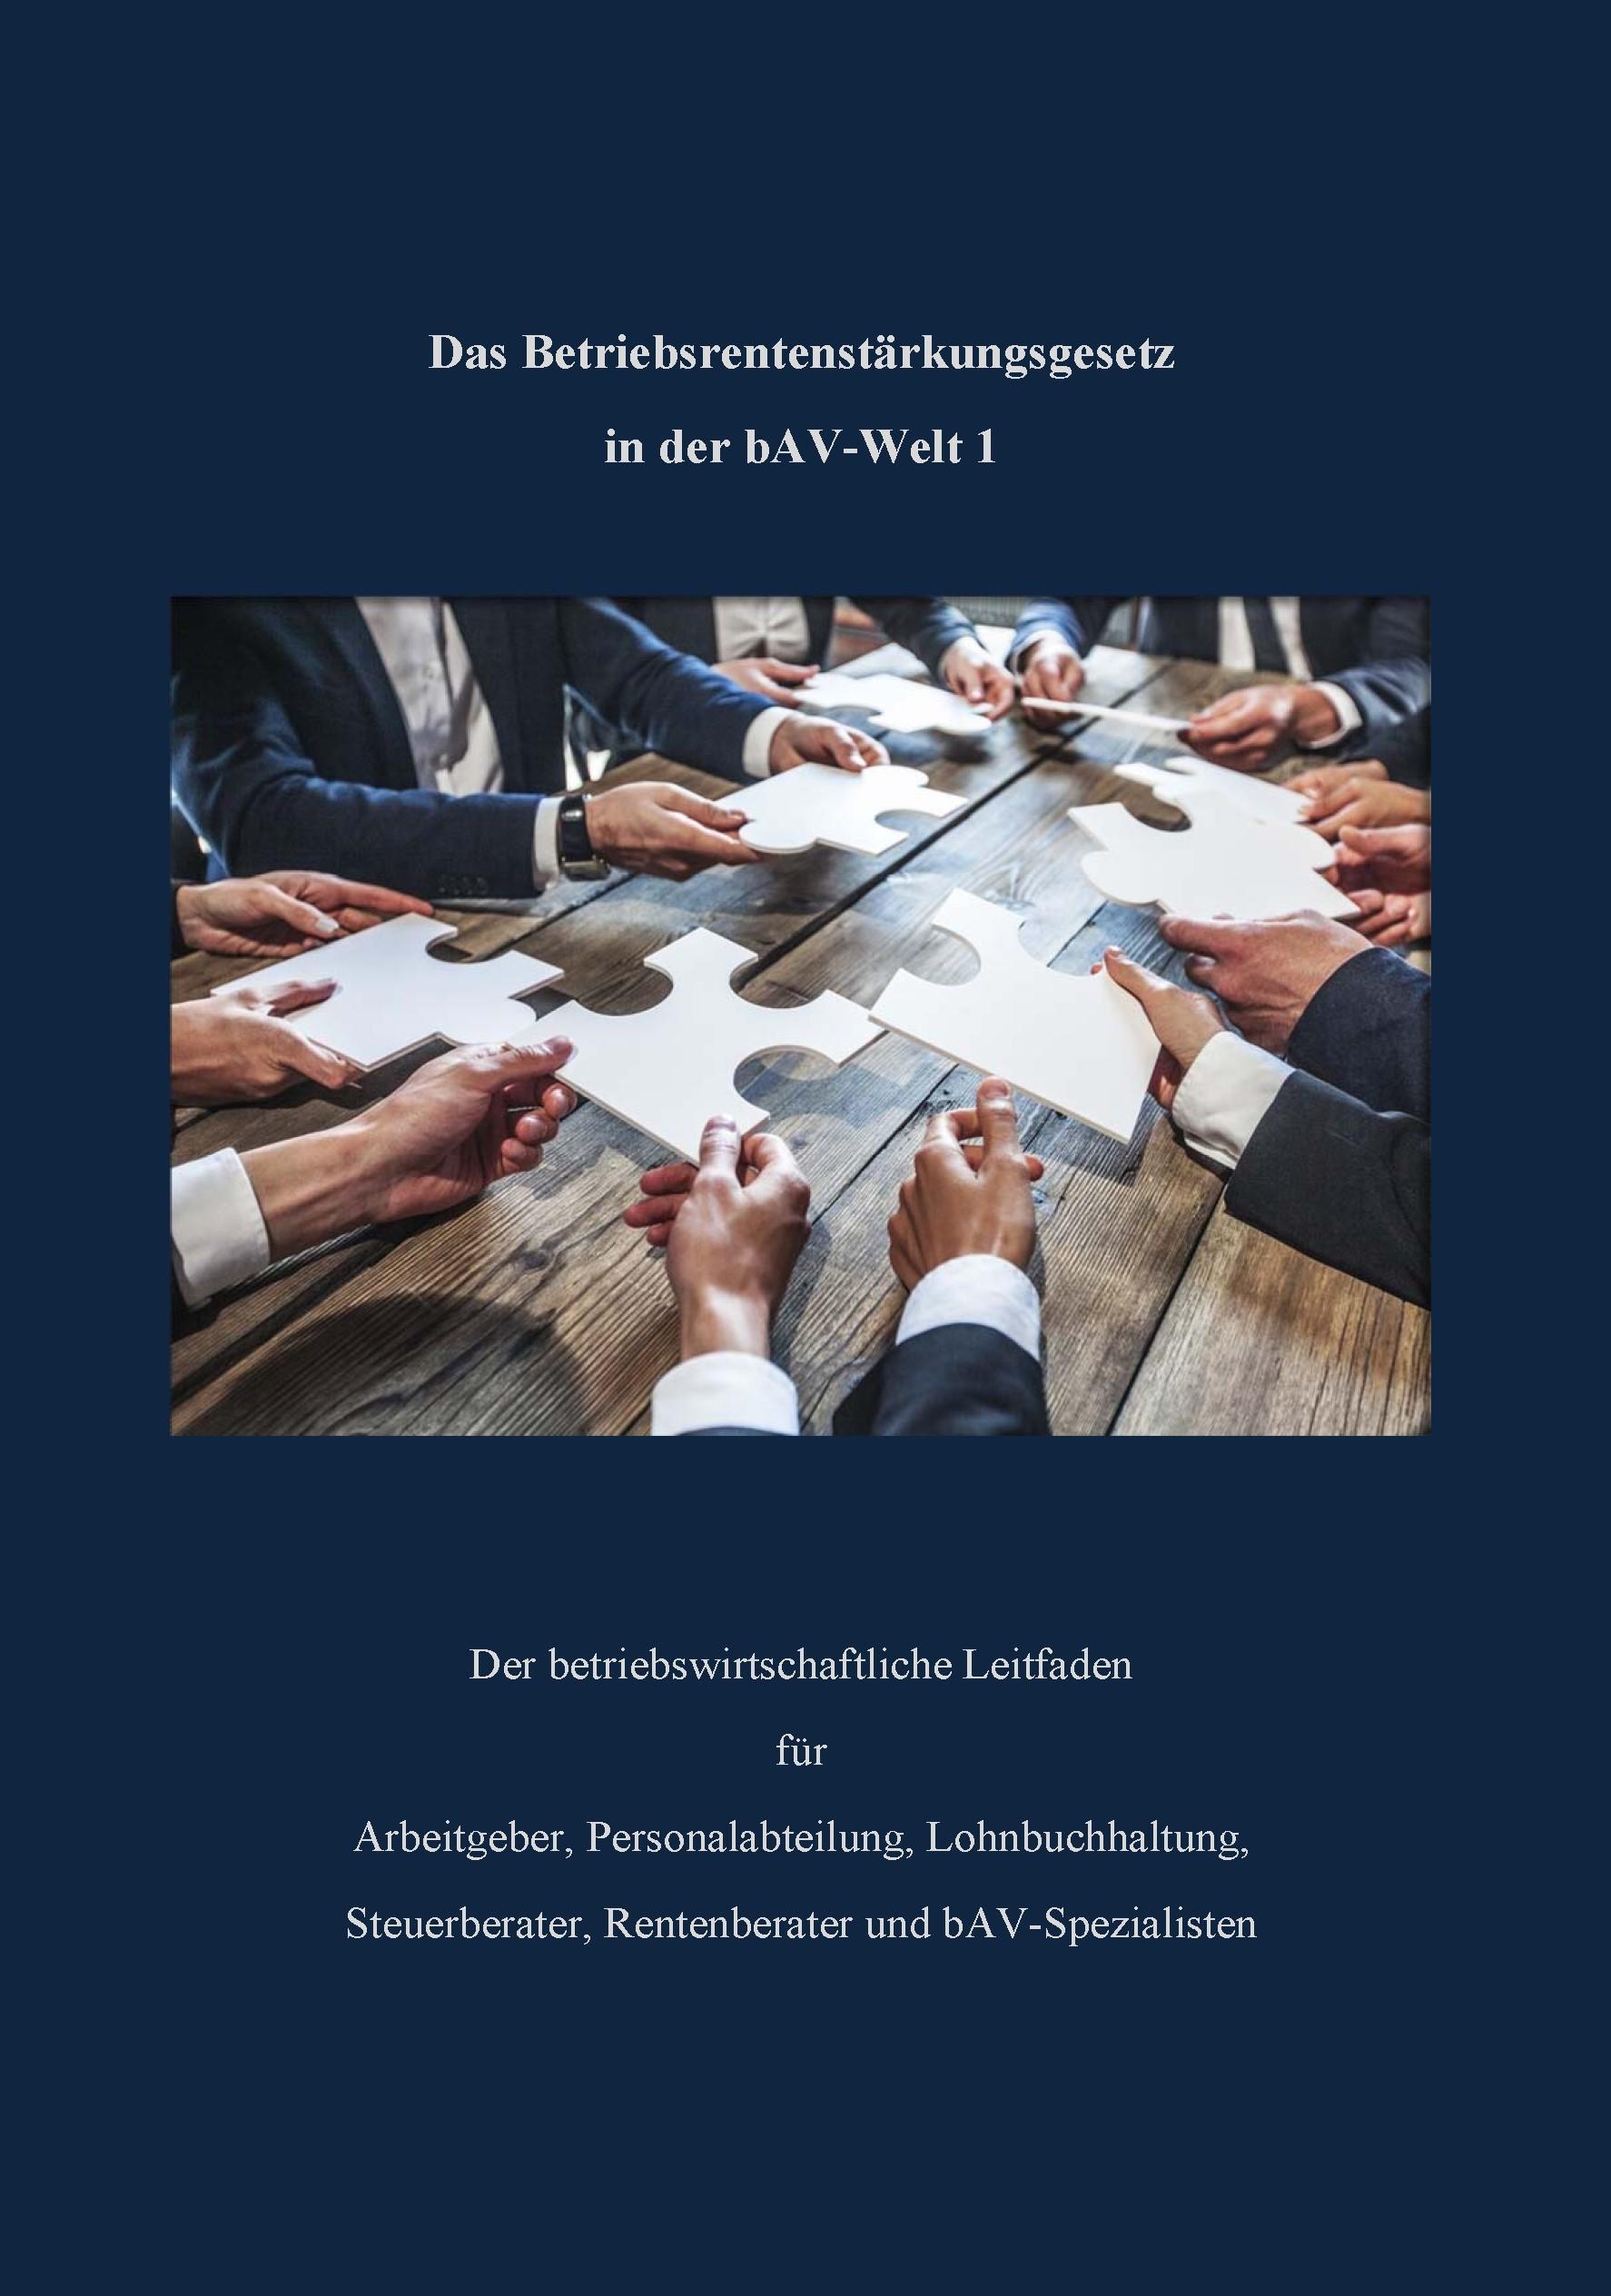 bav-Leitfaden für Arbeitgeber, Personalabteilung, Gehaltsbuchhaltung, HR-Berater, Steuerberater, bav-süezialisten, bAV-Berater, bAV-Experten, Unternehmensberater